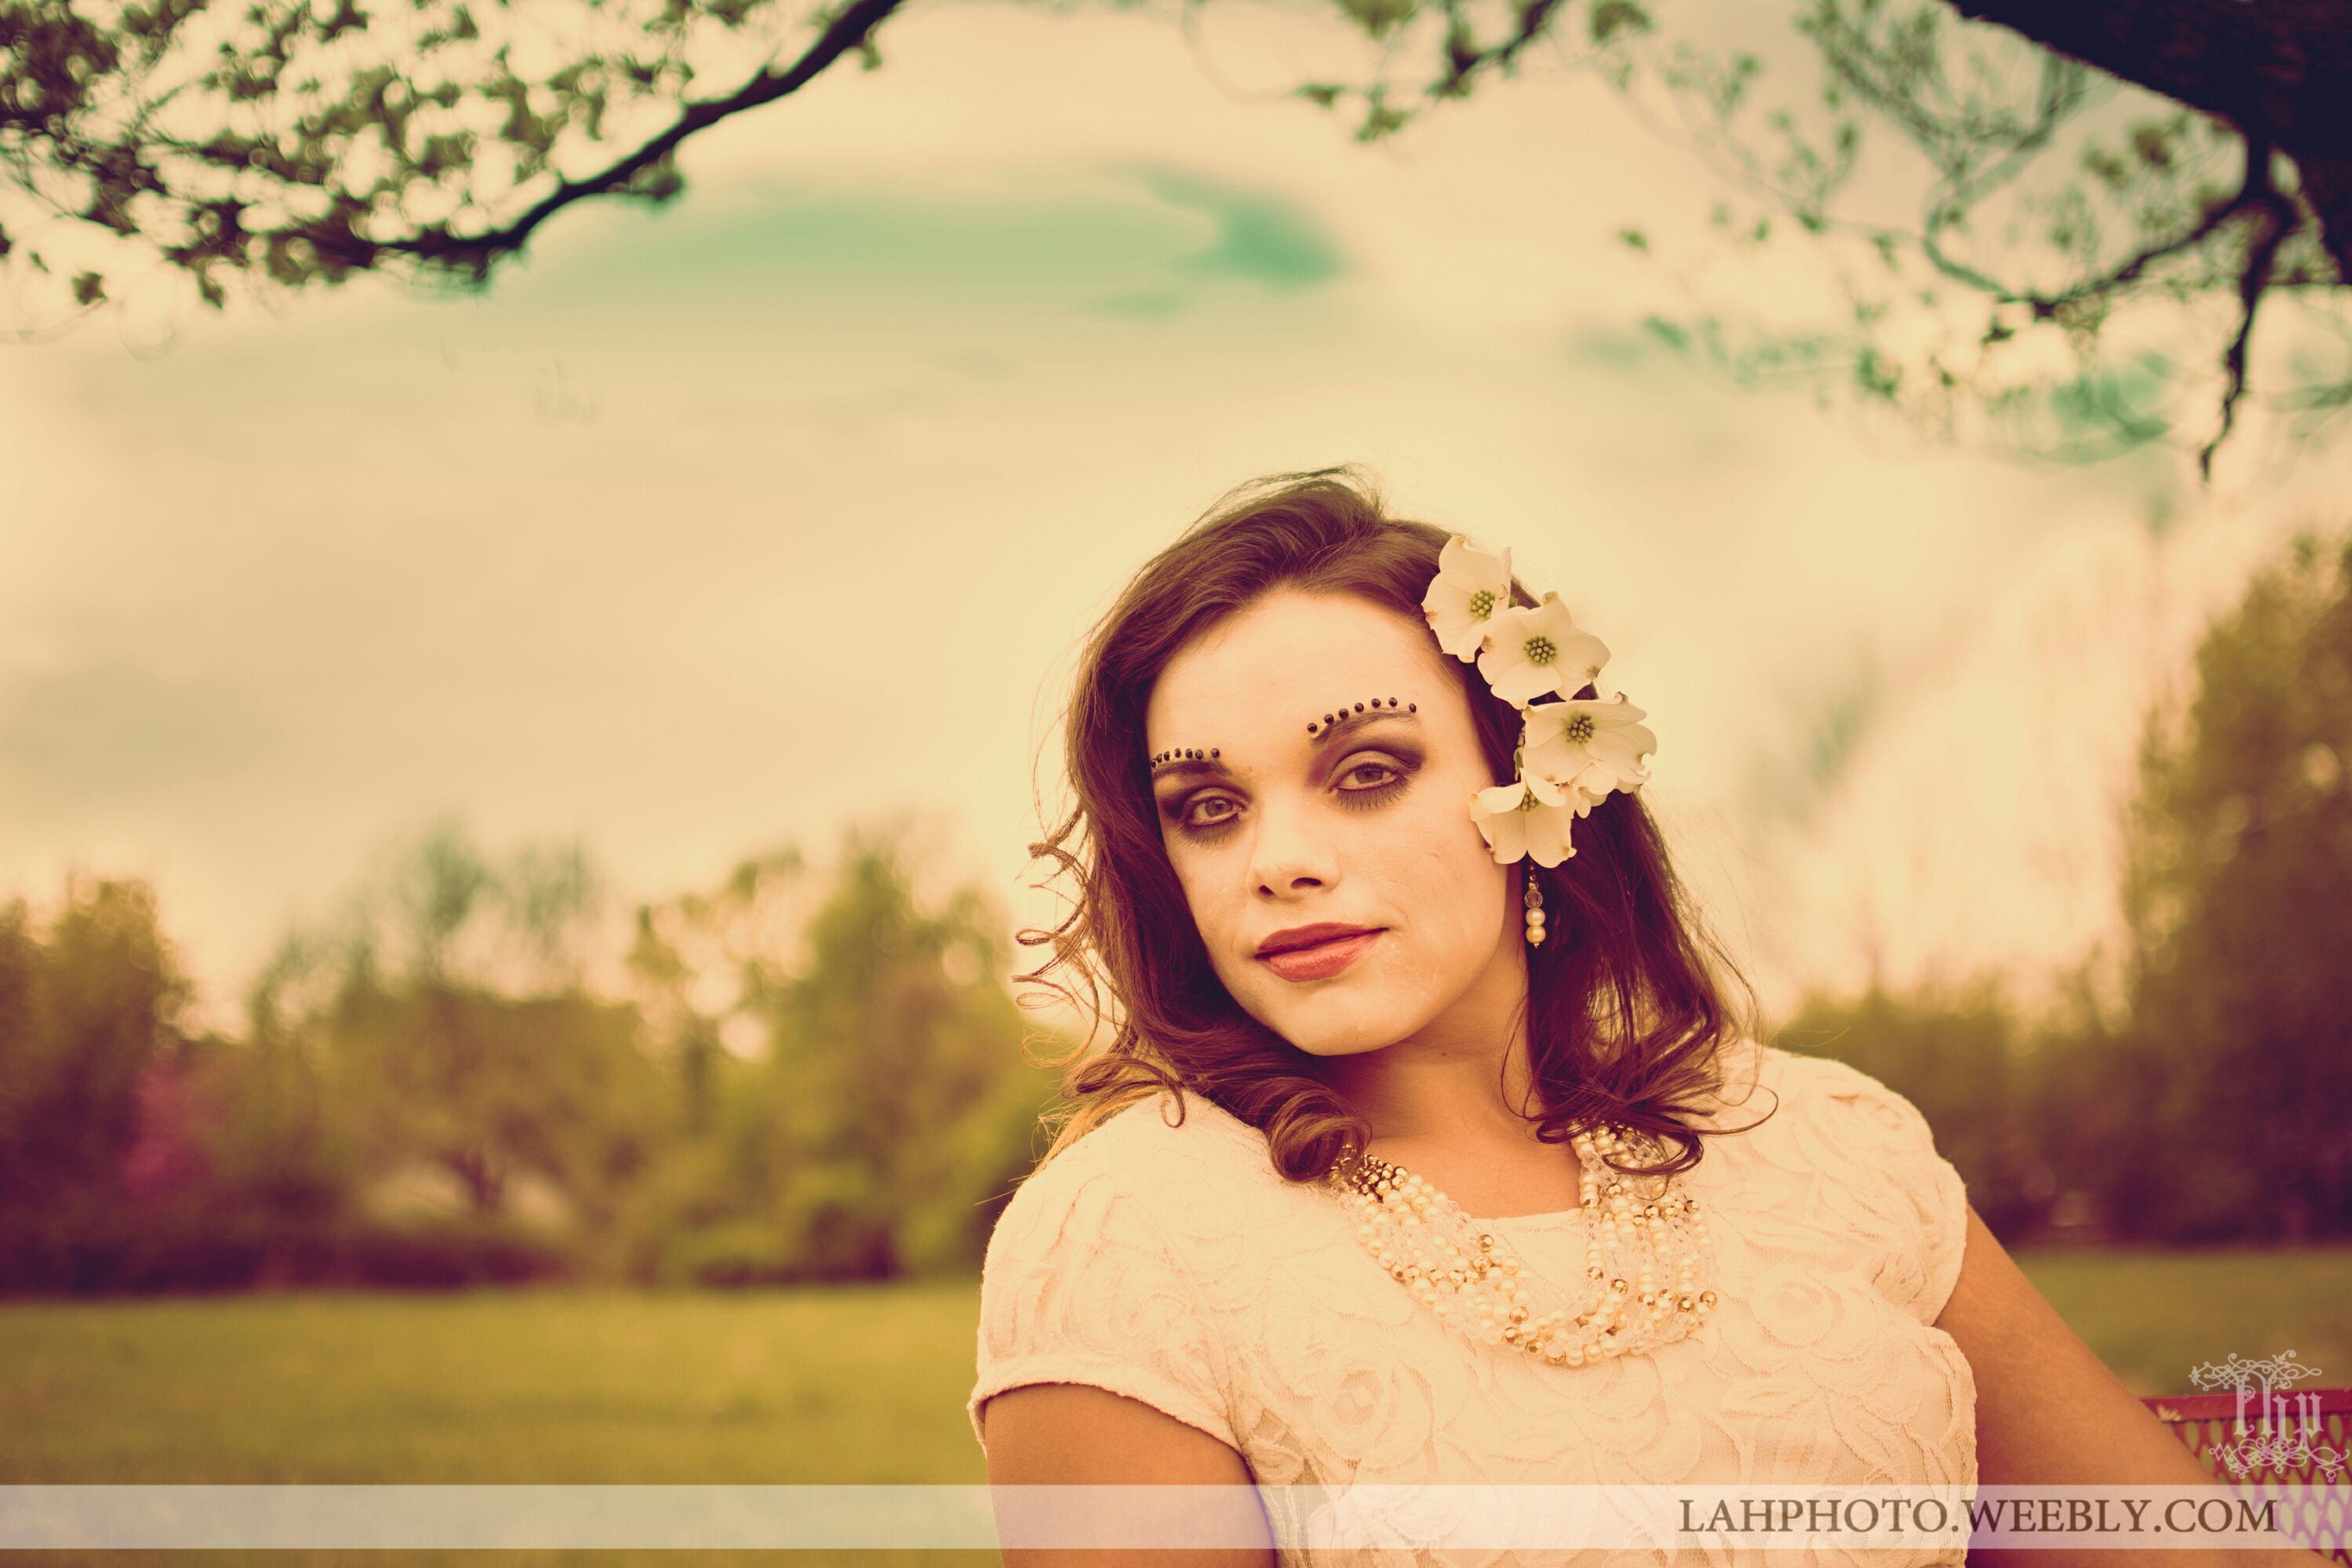 Muah misty dupree model jacqetta Makeup Lahphotonwa Lahphoto Fantasy Flowers